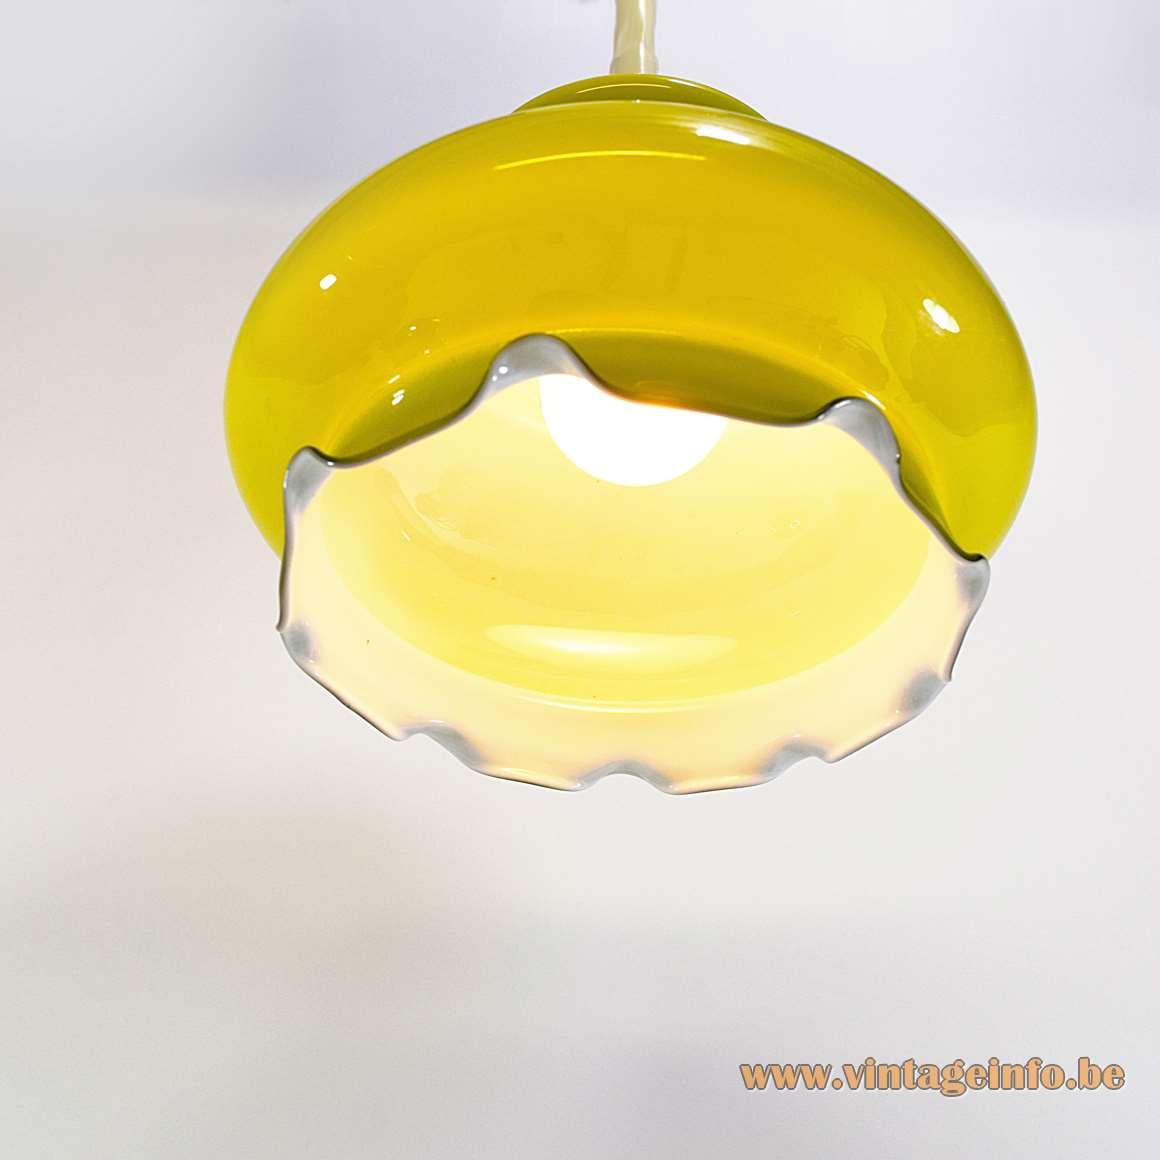 Peill + Putzler Olive Green Yellow Pendant Lamp hand blown glass serrated bottom 1960s 1970s MCM Germany